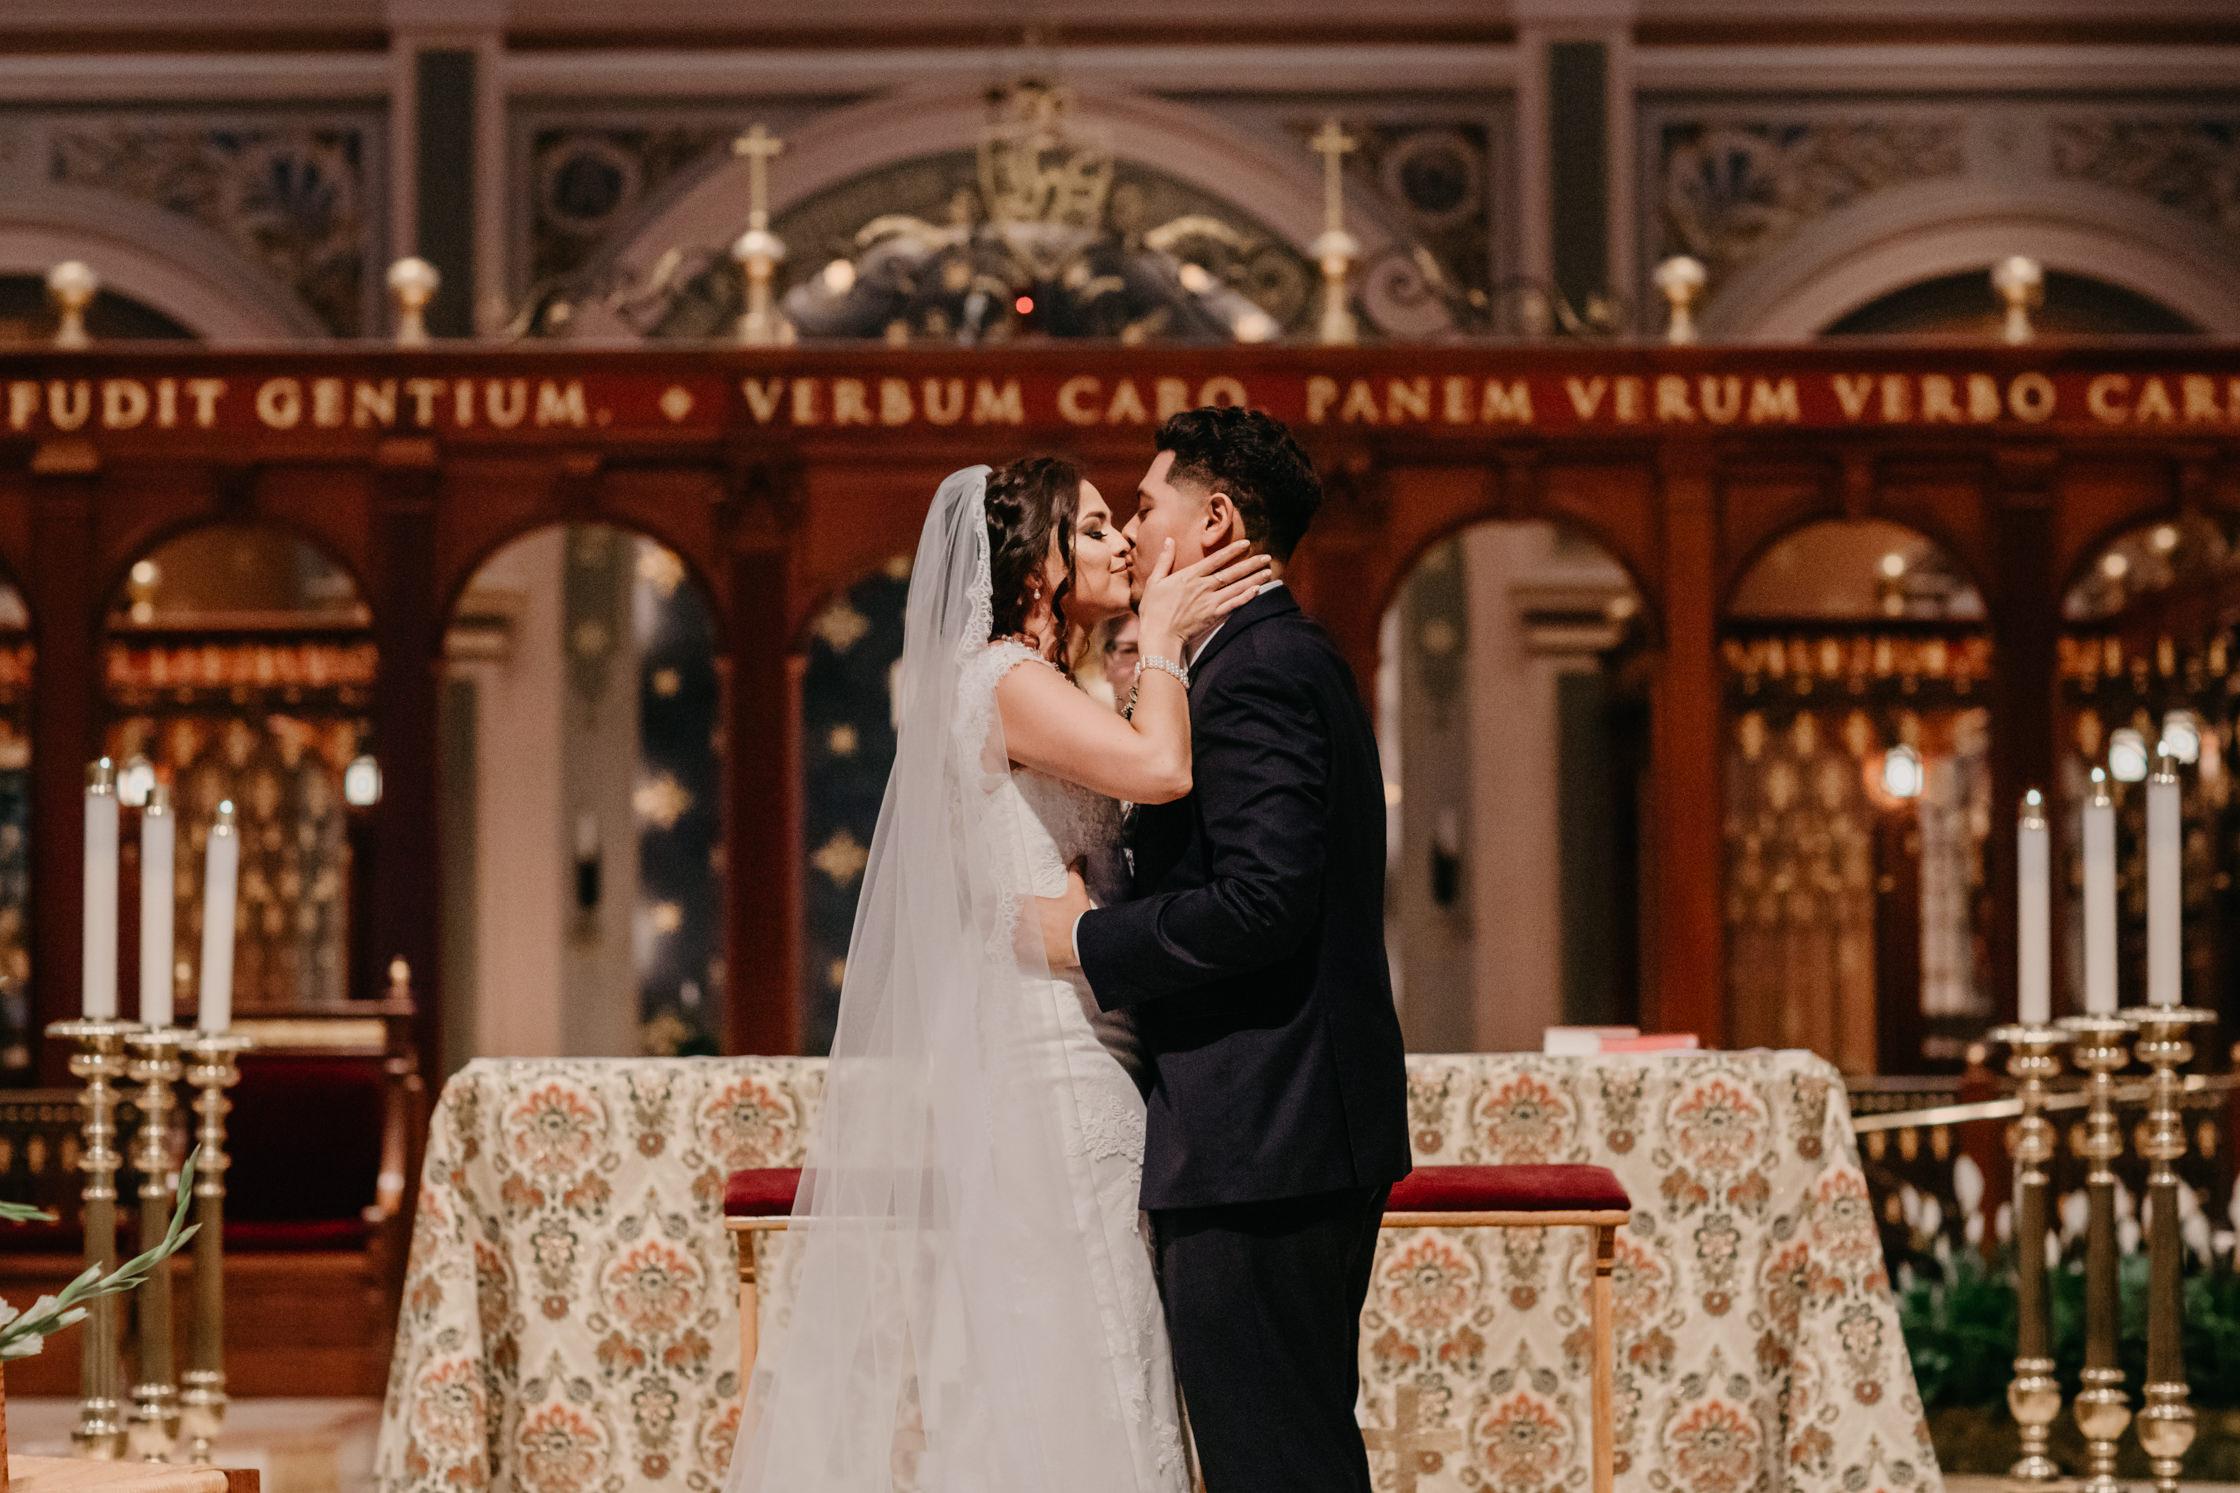 luis_joanna_wedding-42.jpg